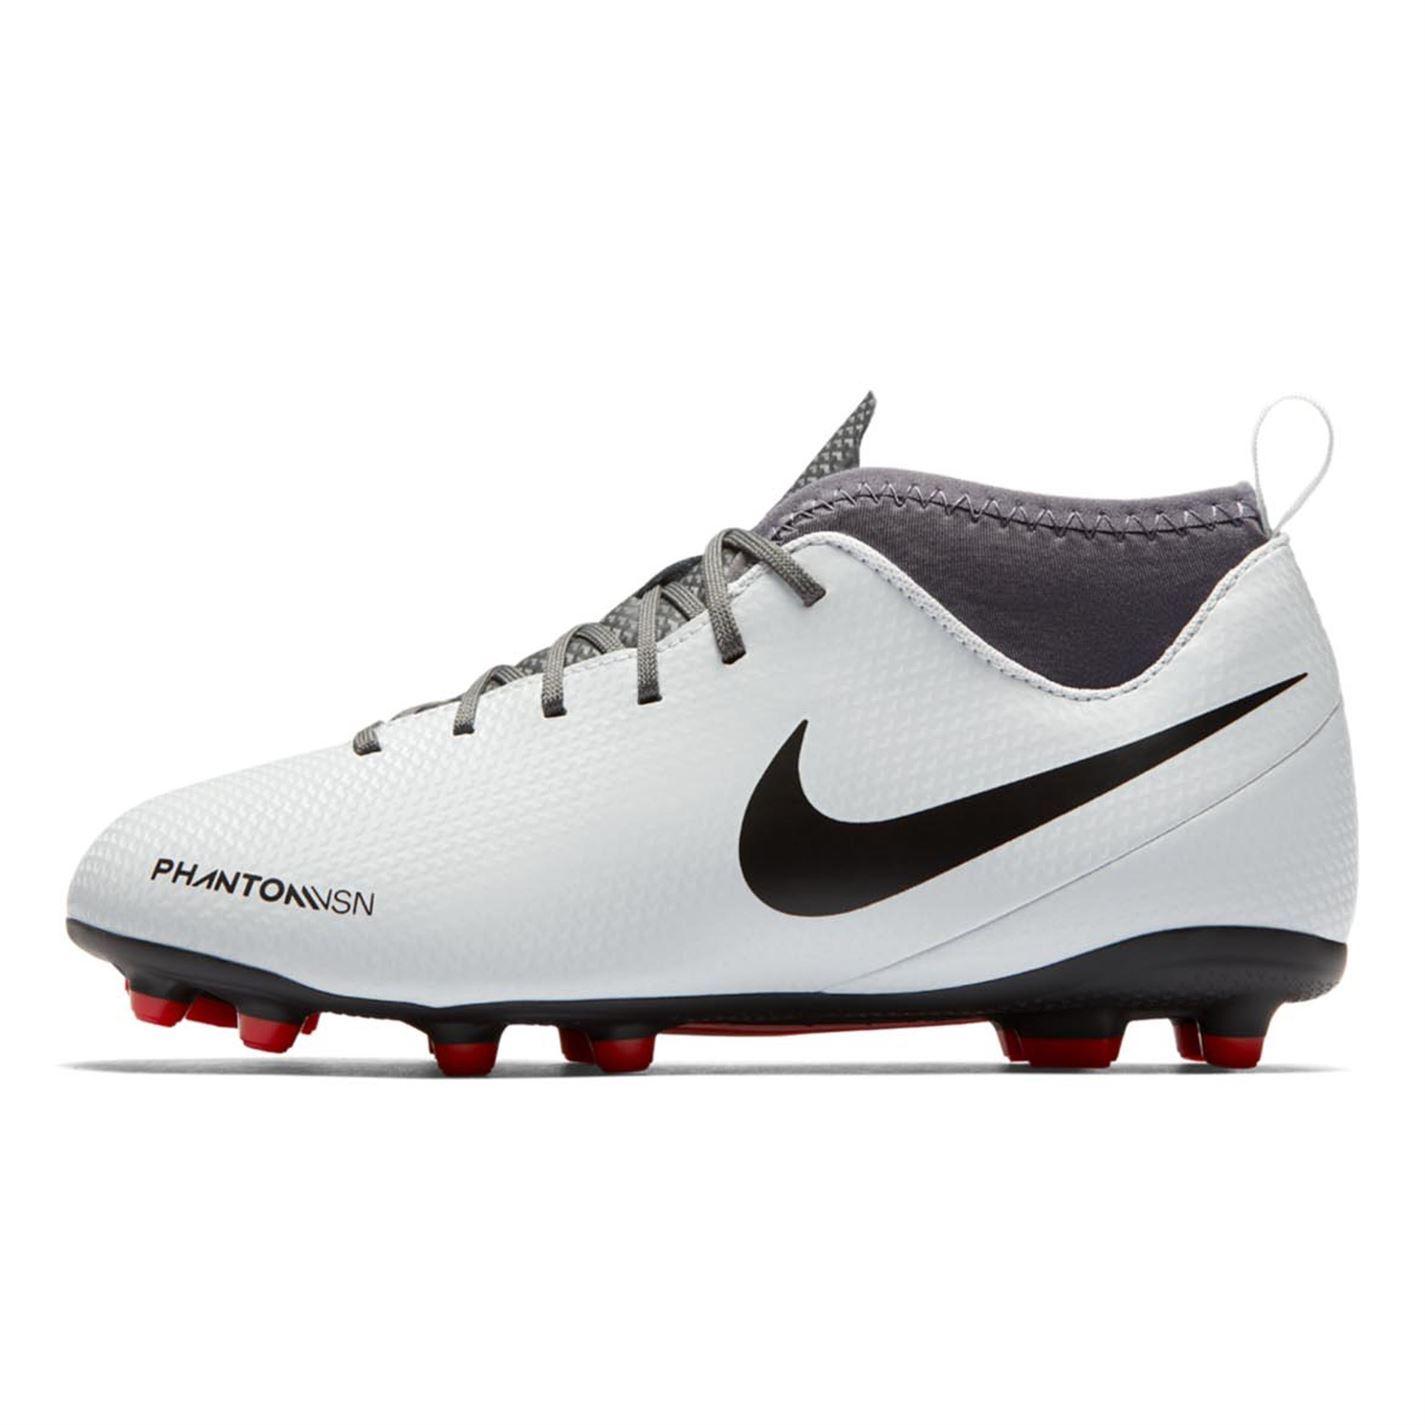 miniature 13 - Nike-Phantom-Vision-Club-DF-FG-Firm-Ground-Chaussures-De-Football-Juniors-Football-Crampons